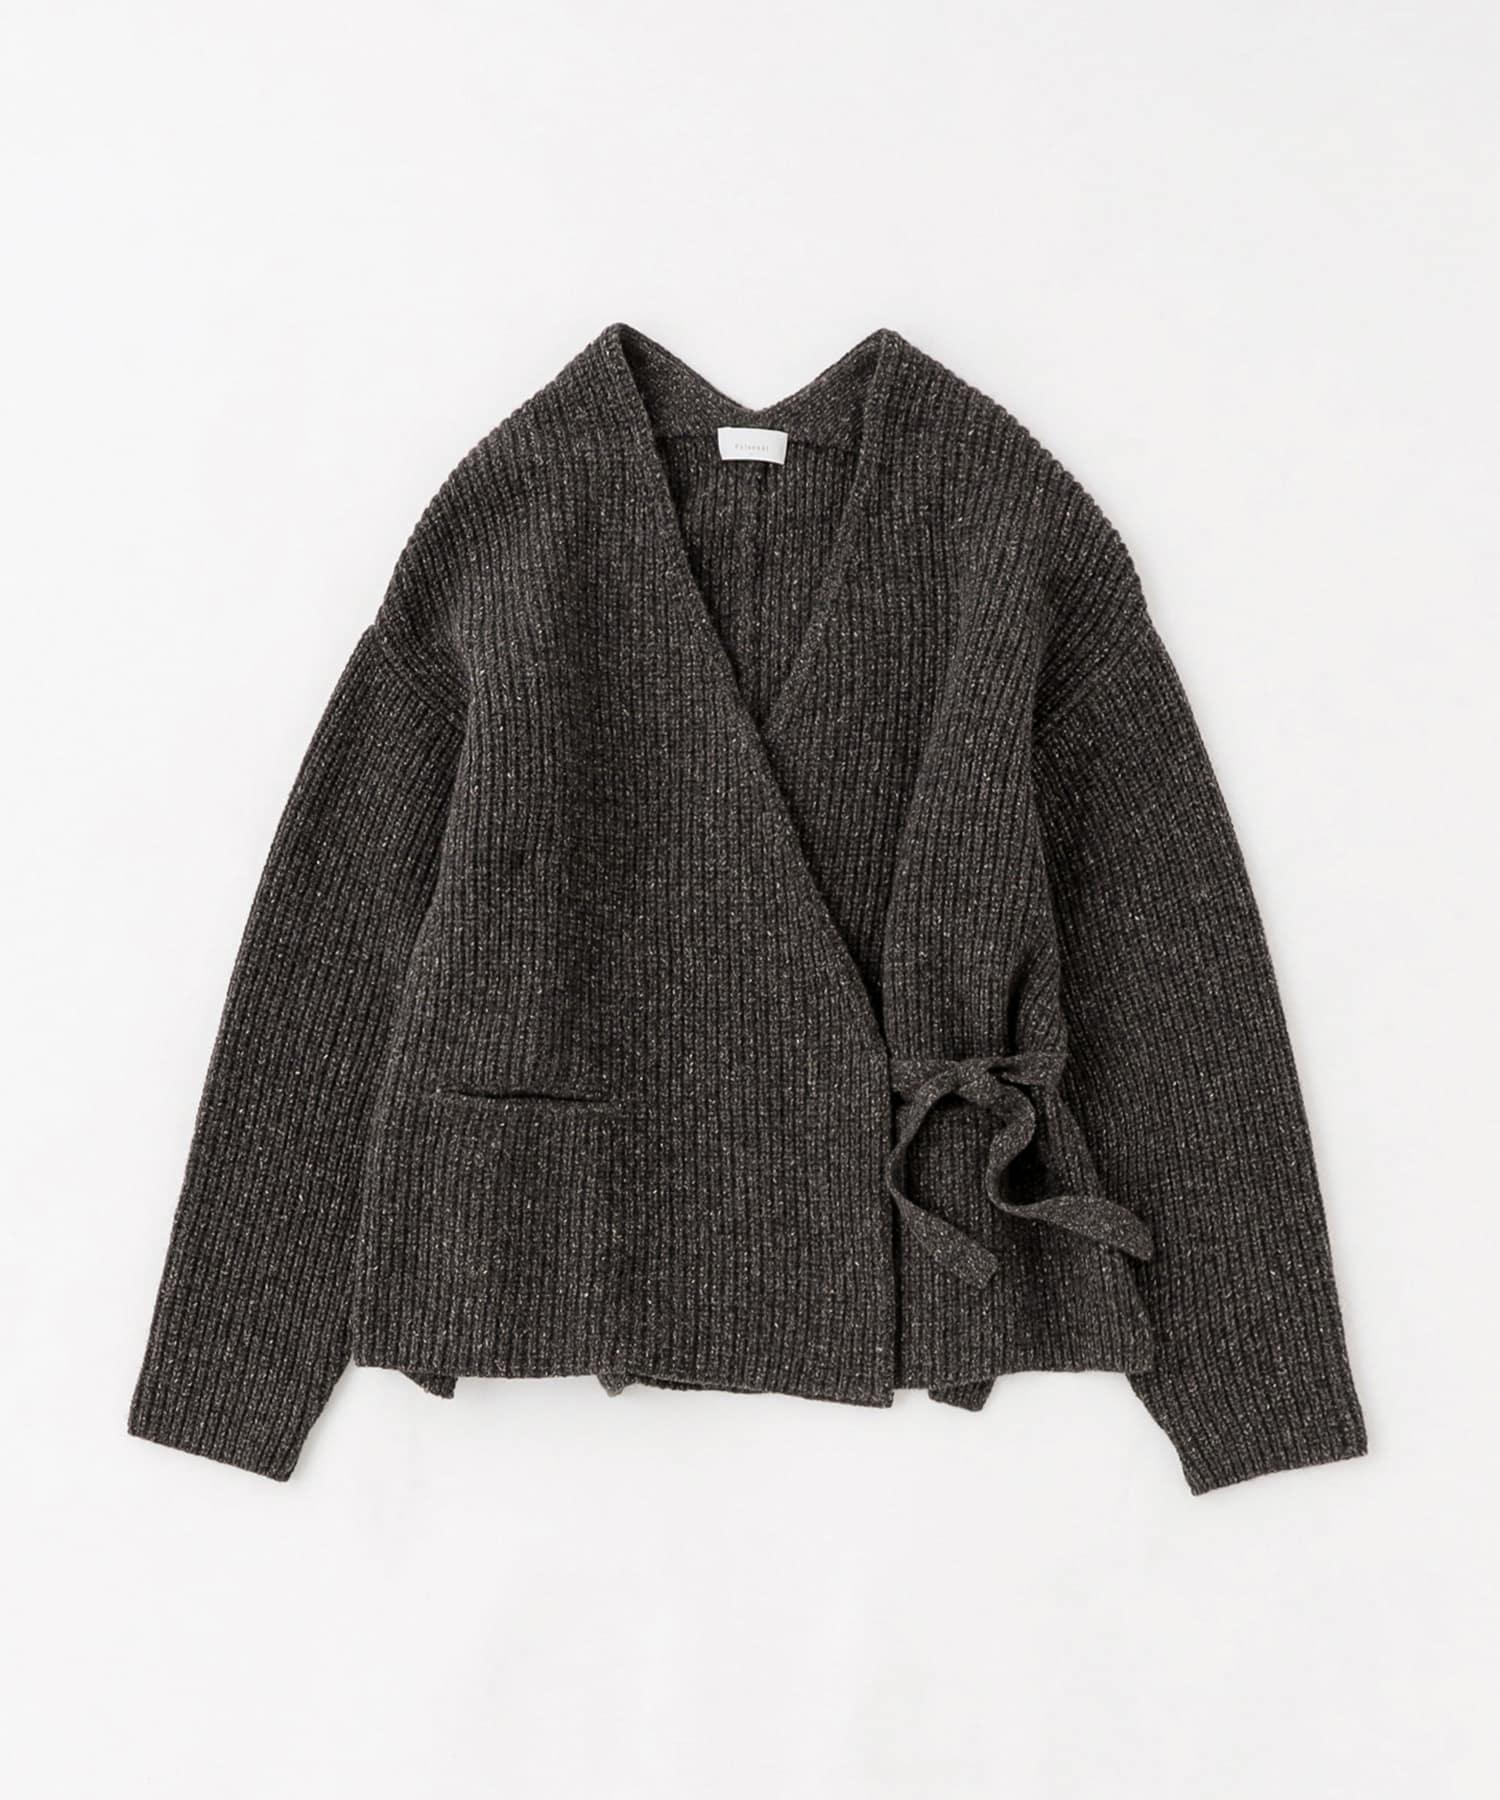 BLOOM&BRANCH(ブルームアンドブランチ) Phlannèl / Wool Silk Nep Wrap Cardigan